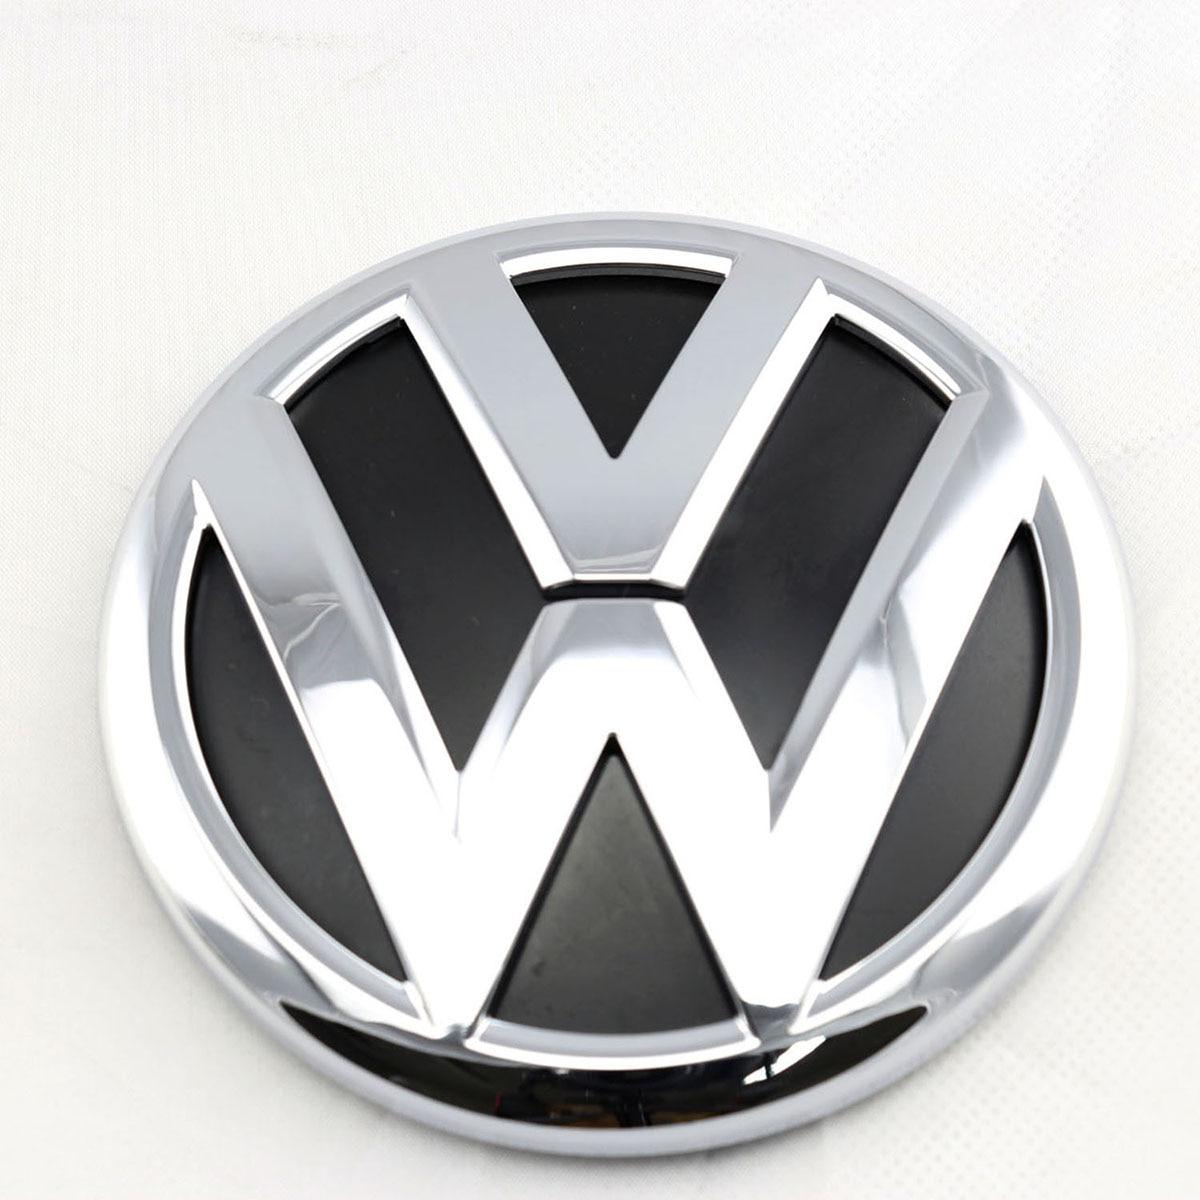 oem rear trunk lid badge emblem chrome logo fit vw jetta mk vi       ulm